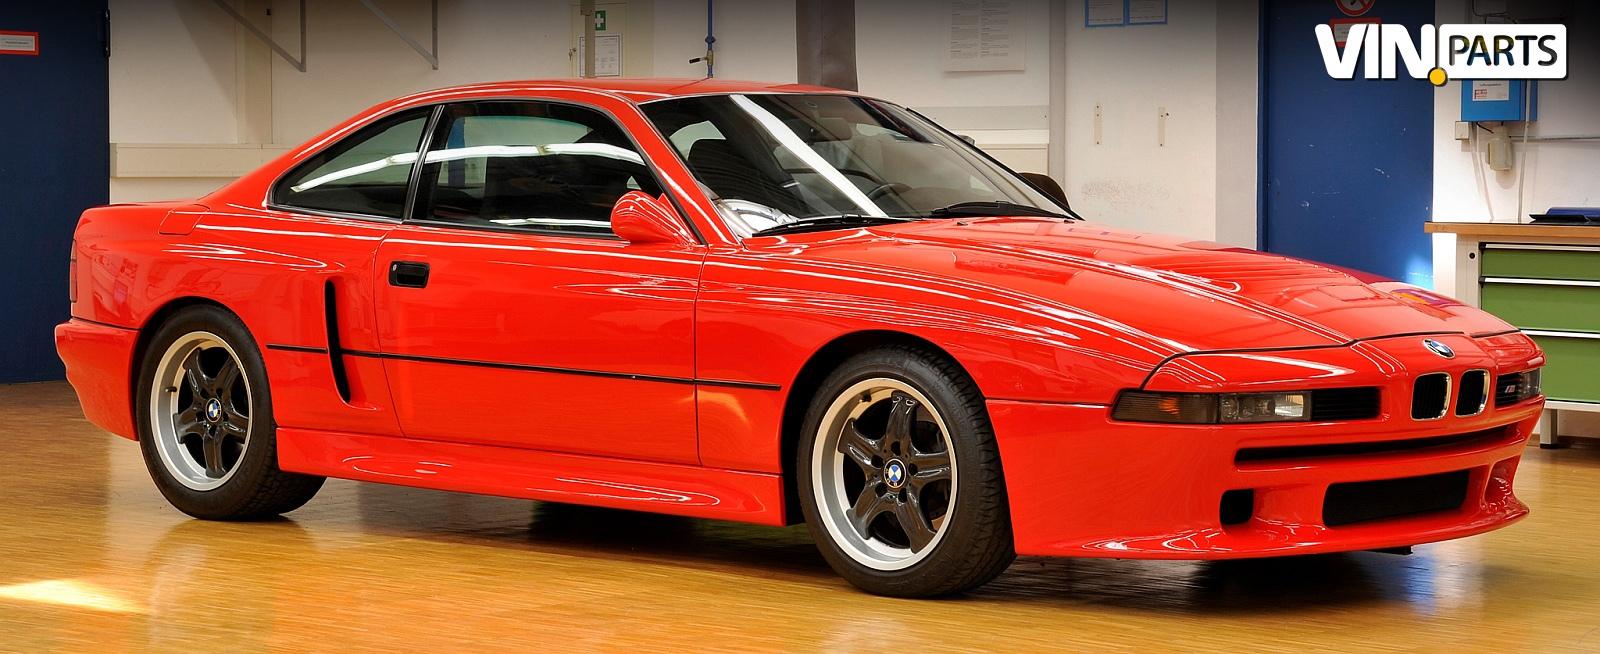 BMW M8 E31 protptype